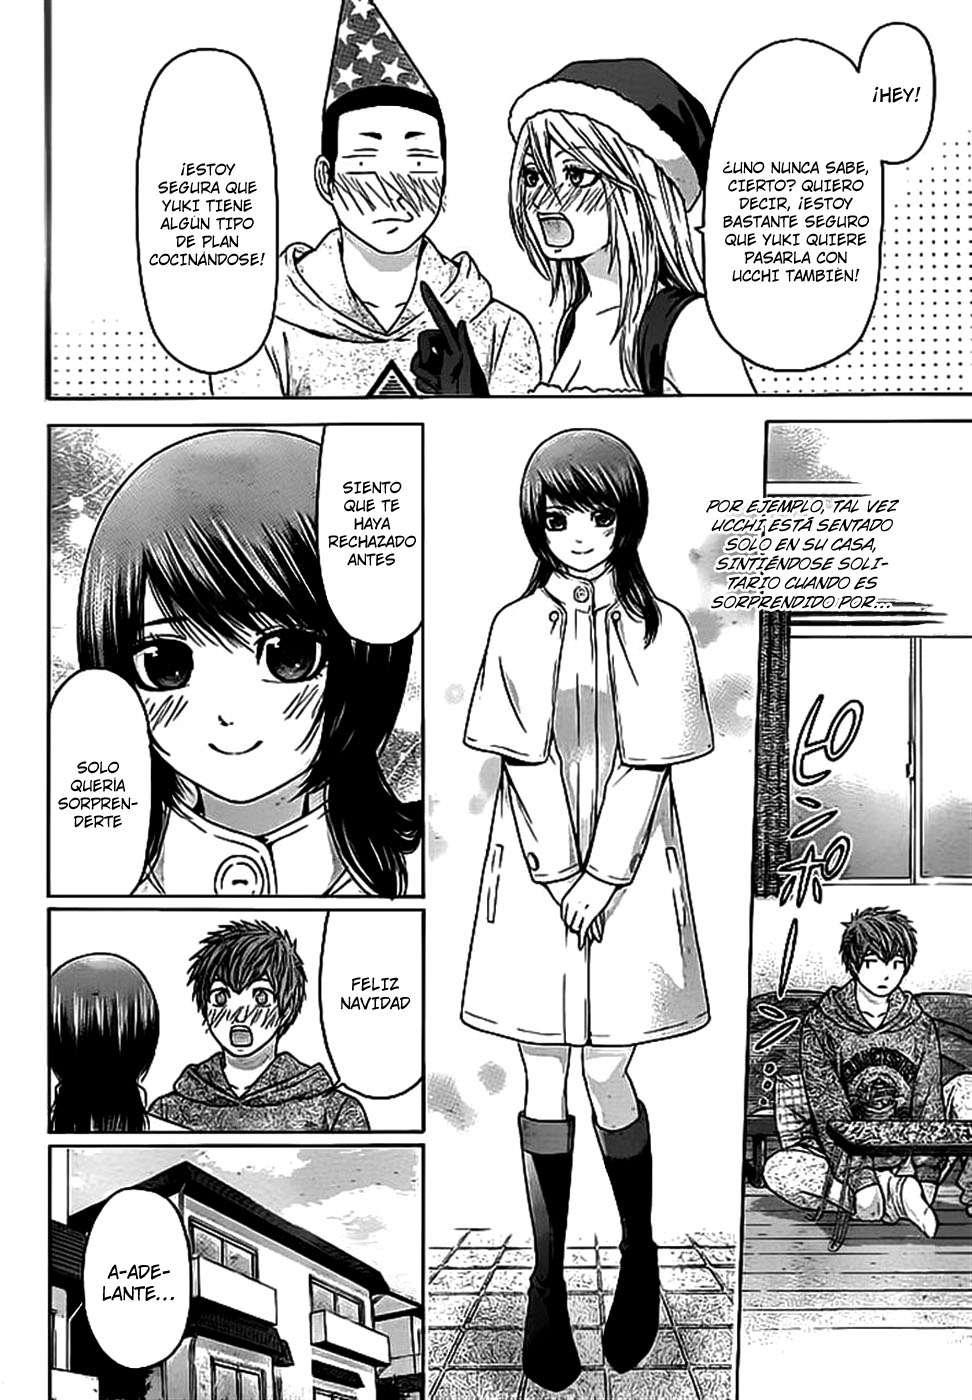 http://c5.ninemanga.com/es_manga/35/419/356717/47d40767c7e9df50249ebfd9c7cfff77.jpg Page 6